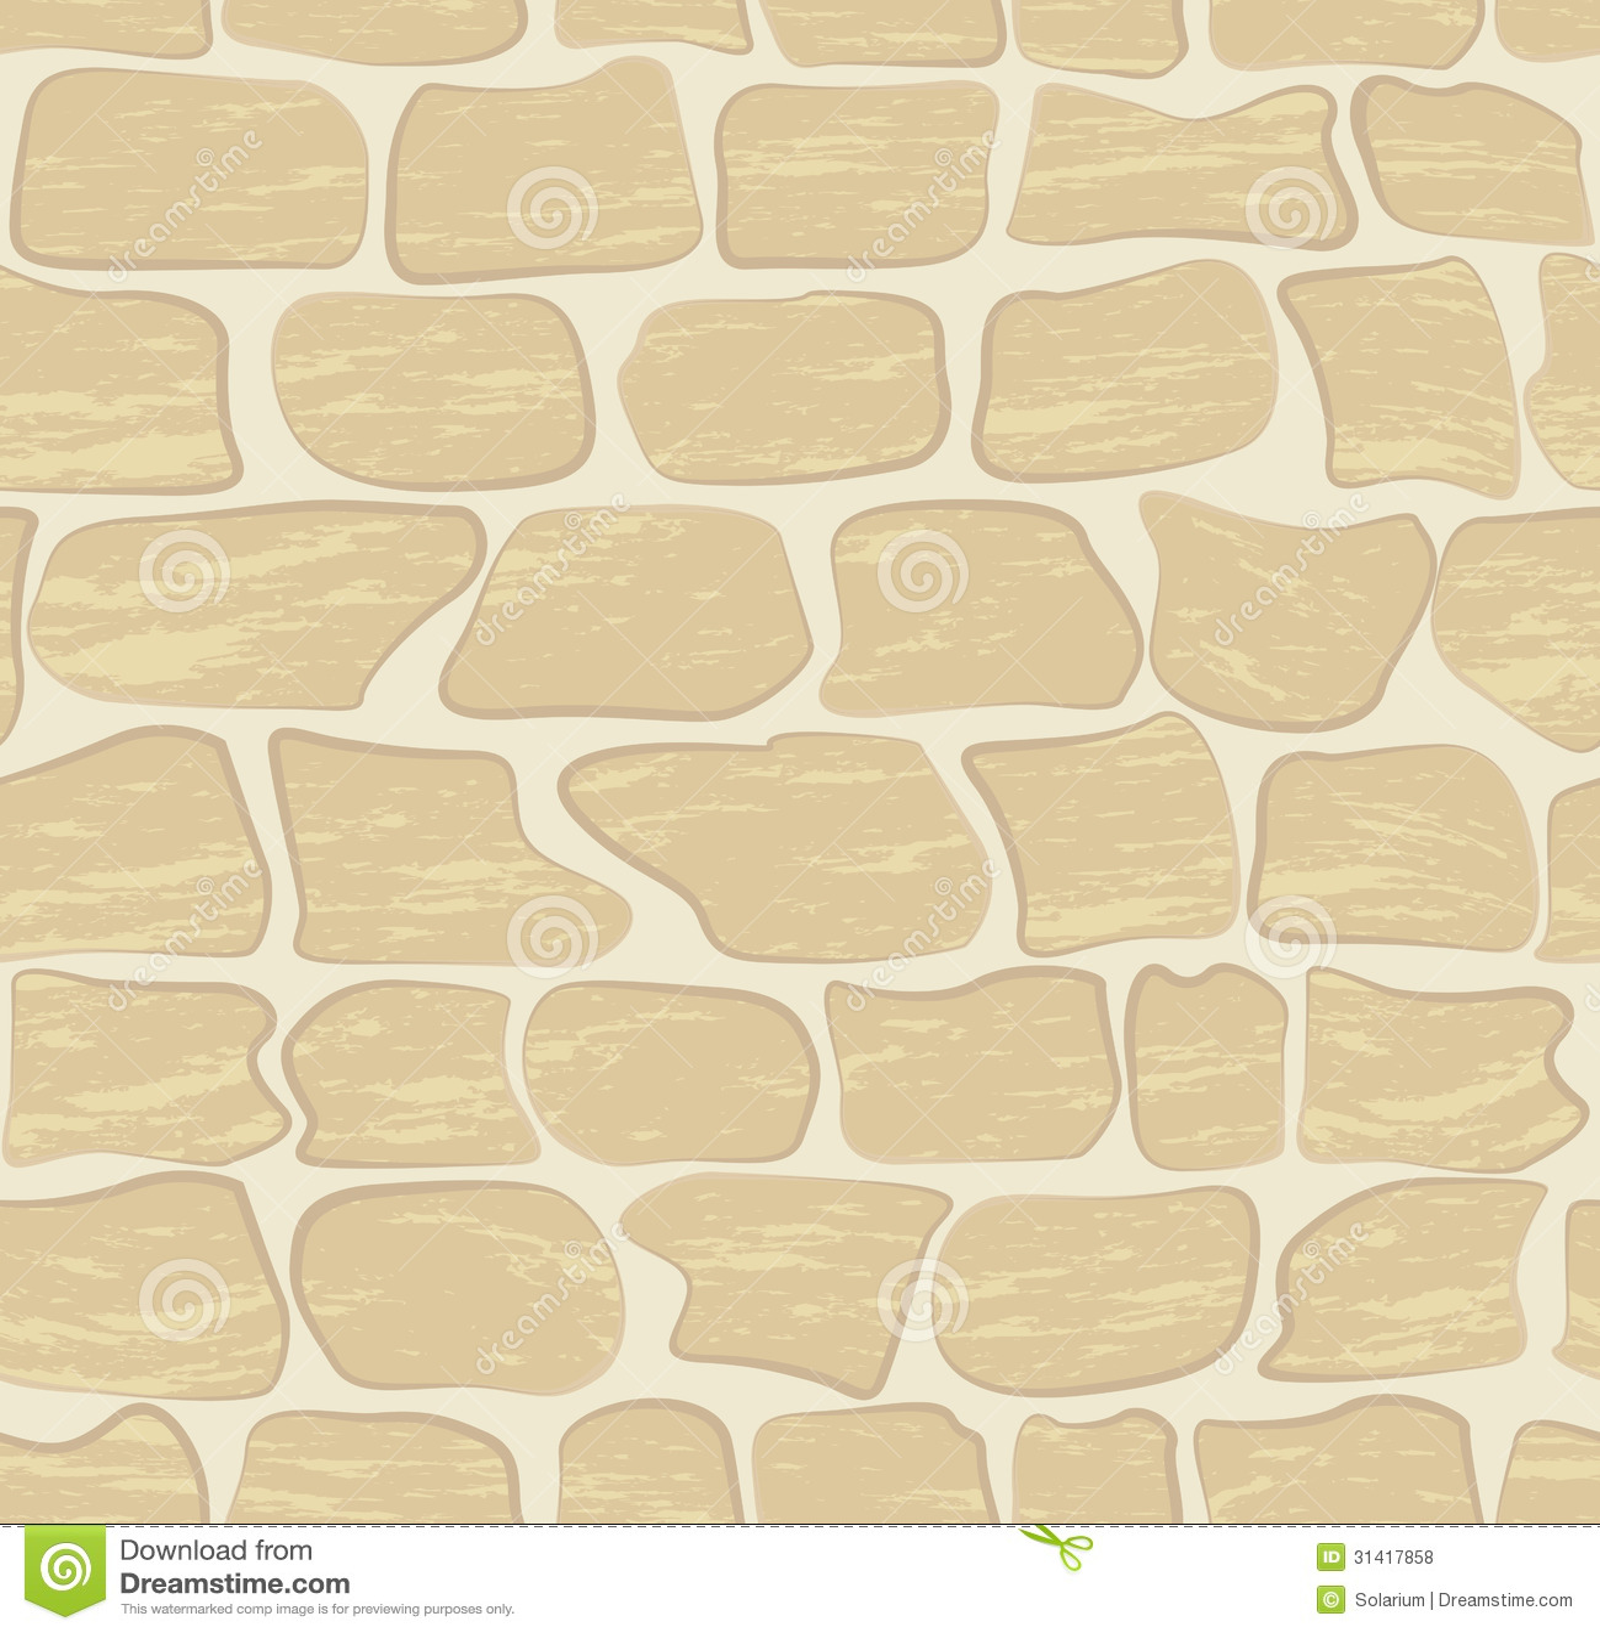 Stone Wall Royalty Free Stock Photos Image 31417858